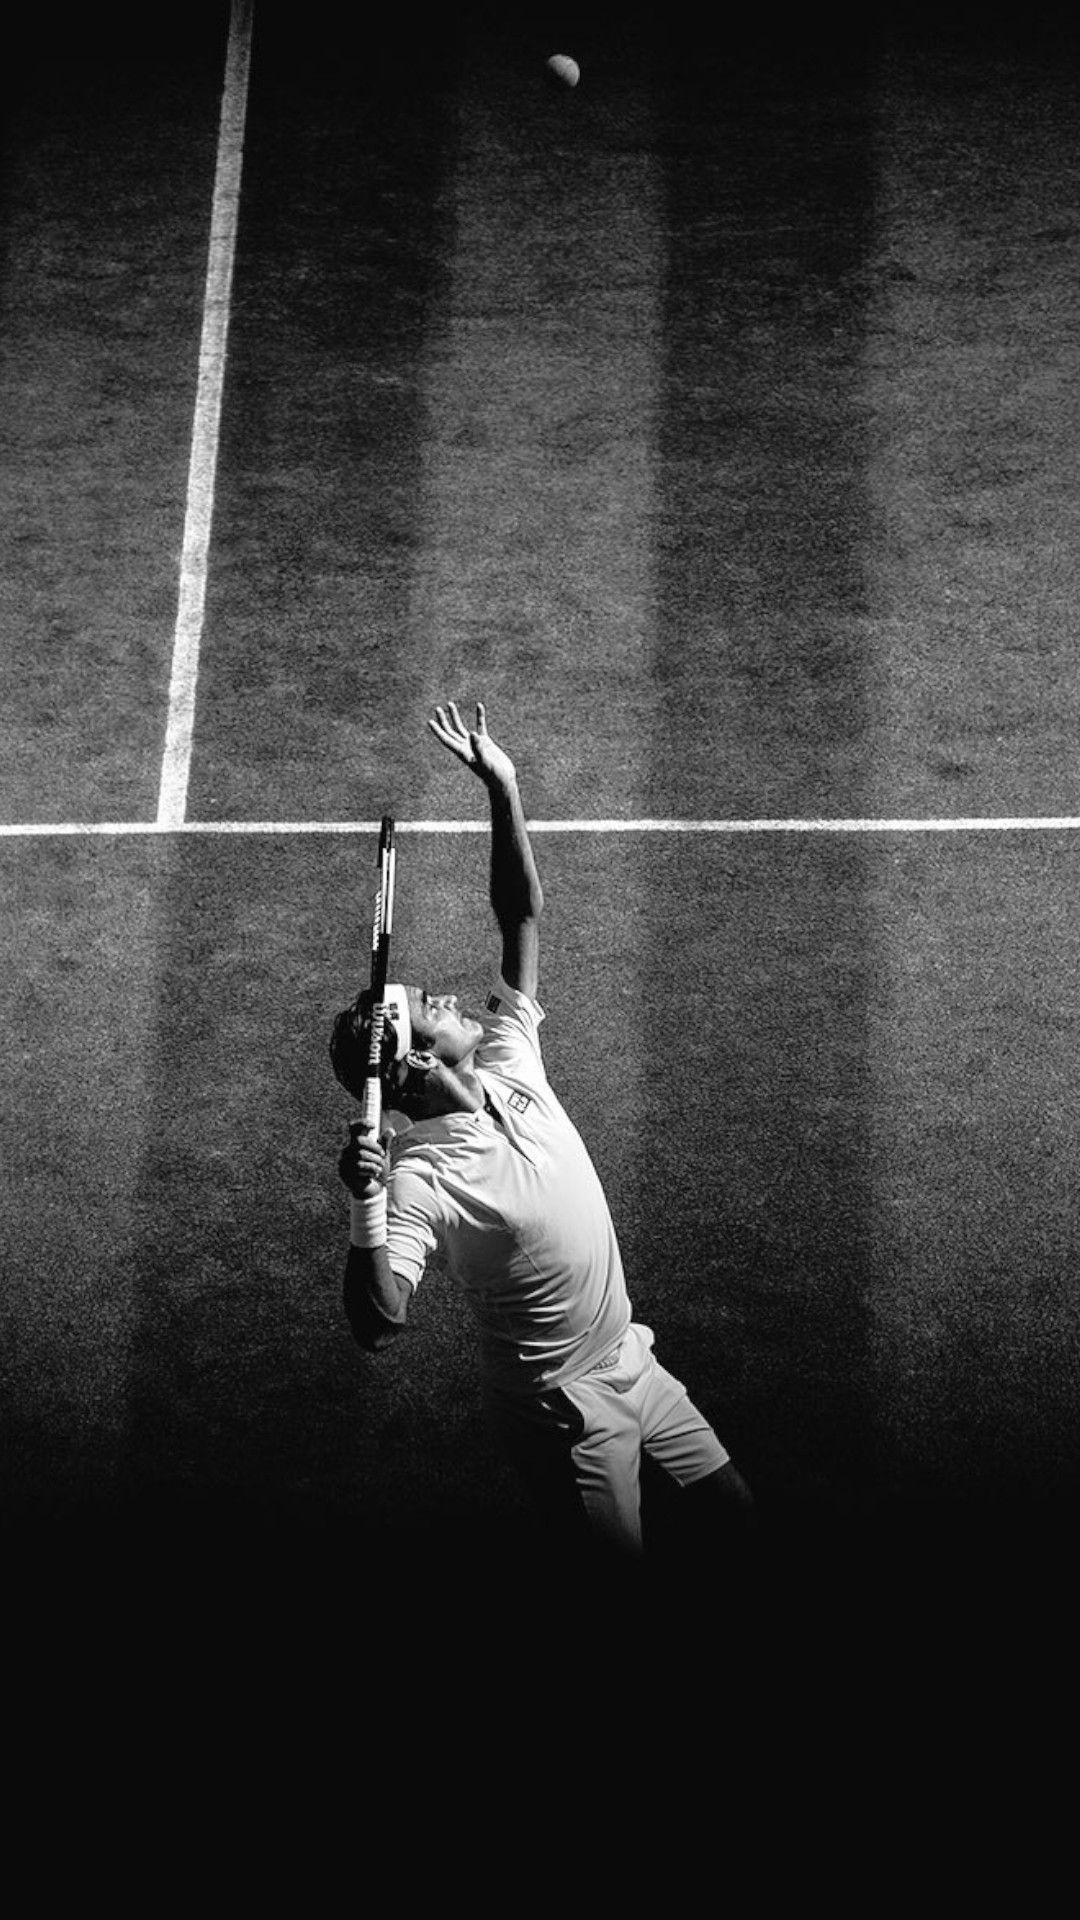 Roger Federer フェデラー ロジャーフェデラー 男子 テニス